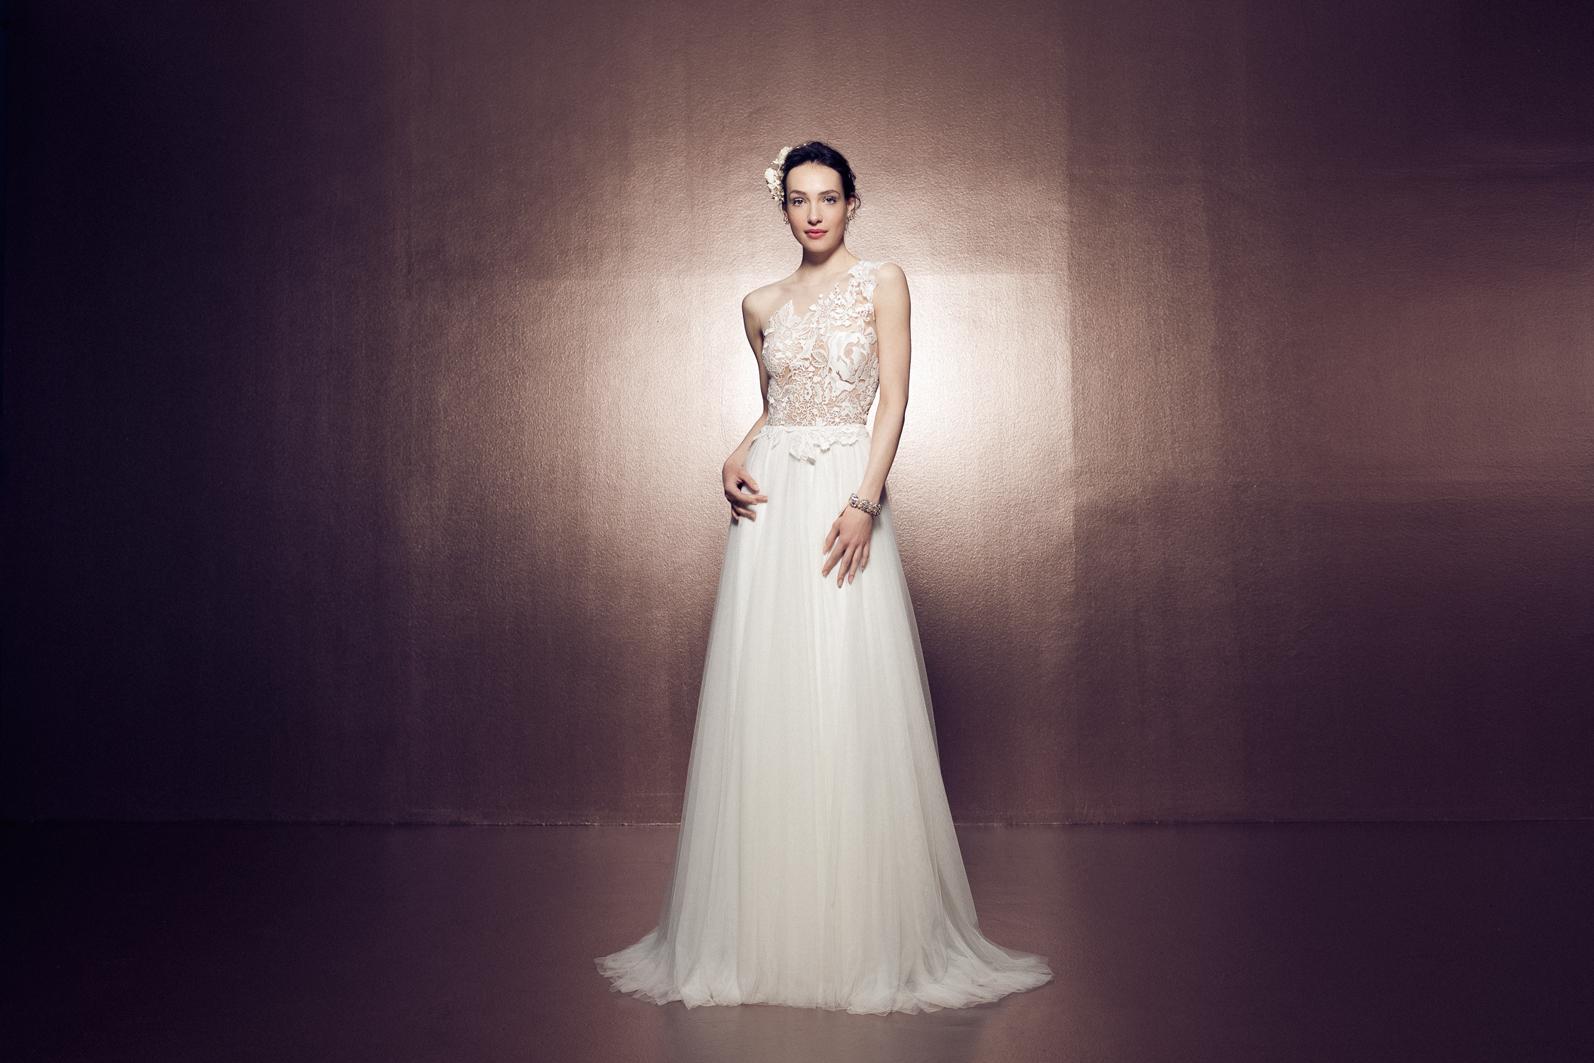 727a614c533a Daalarna 8 - B. Loved Bridal Boutique